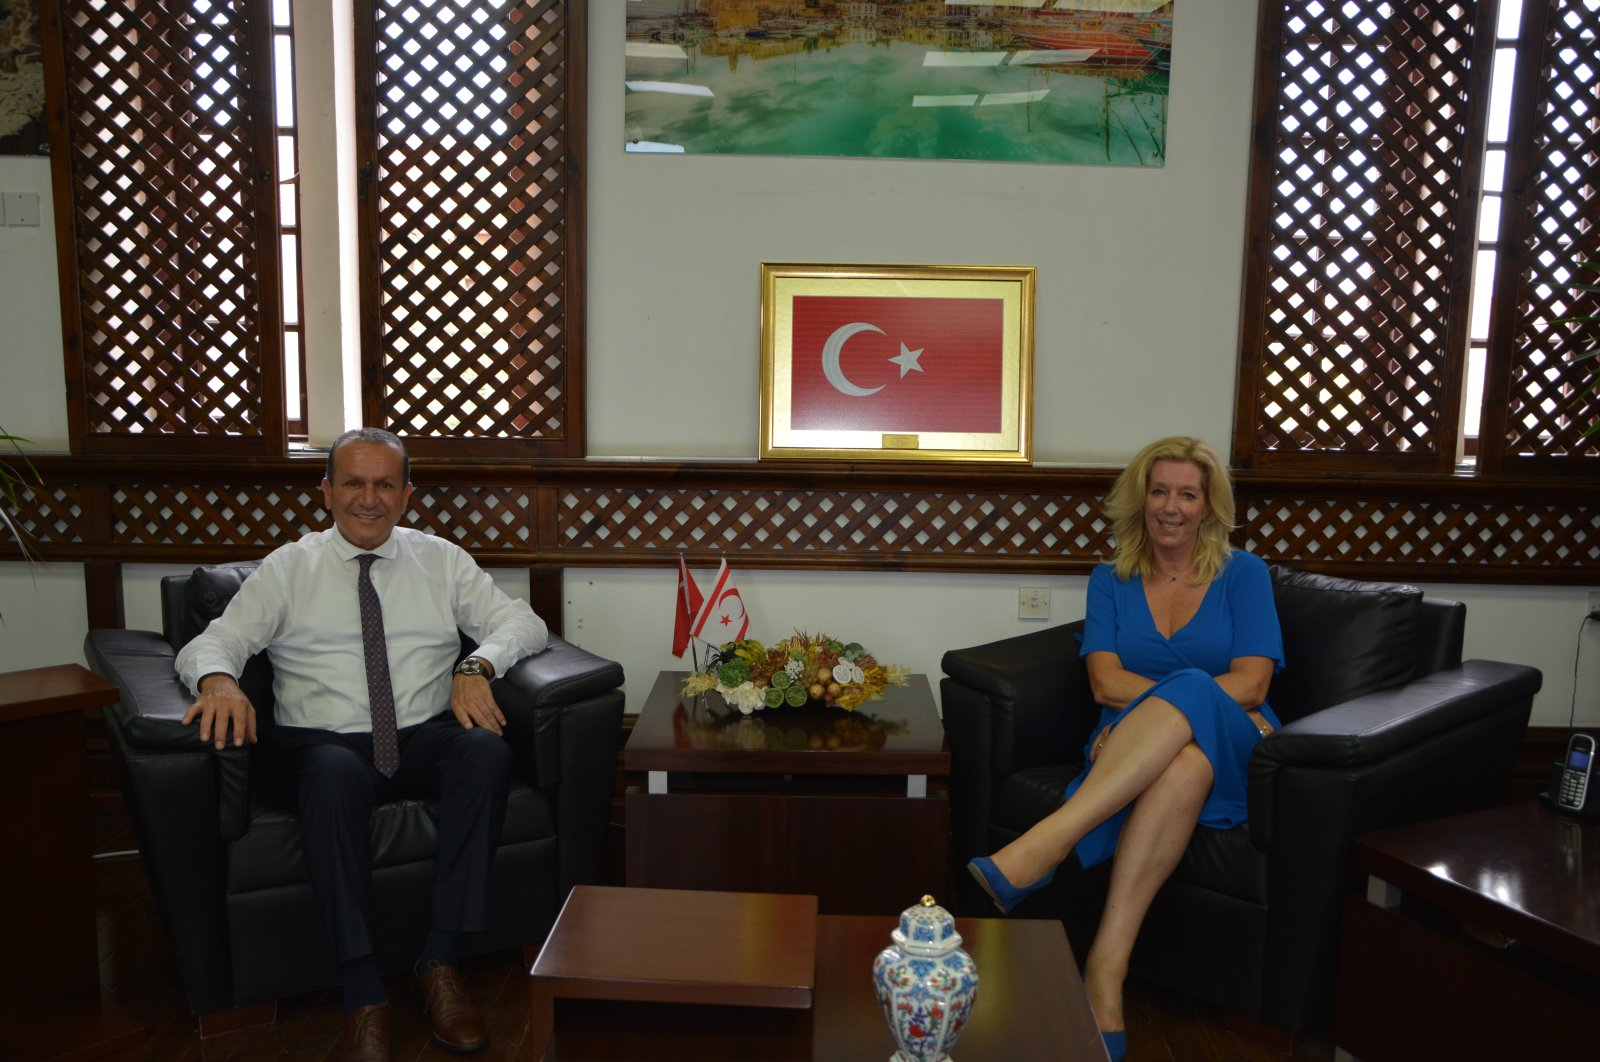 Turkish Cyprus' Tourism Minister Fikri Ataoğlu (L) meets with Dutch lawmaker Liane den Haan in Lefkoşa (Nicosia), TRNC, Aug. 16, 2021. (AA Photo)